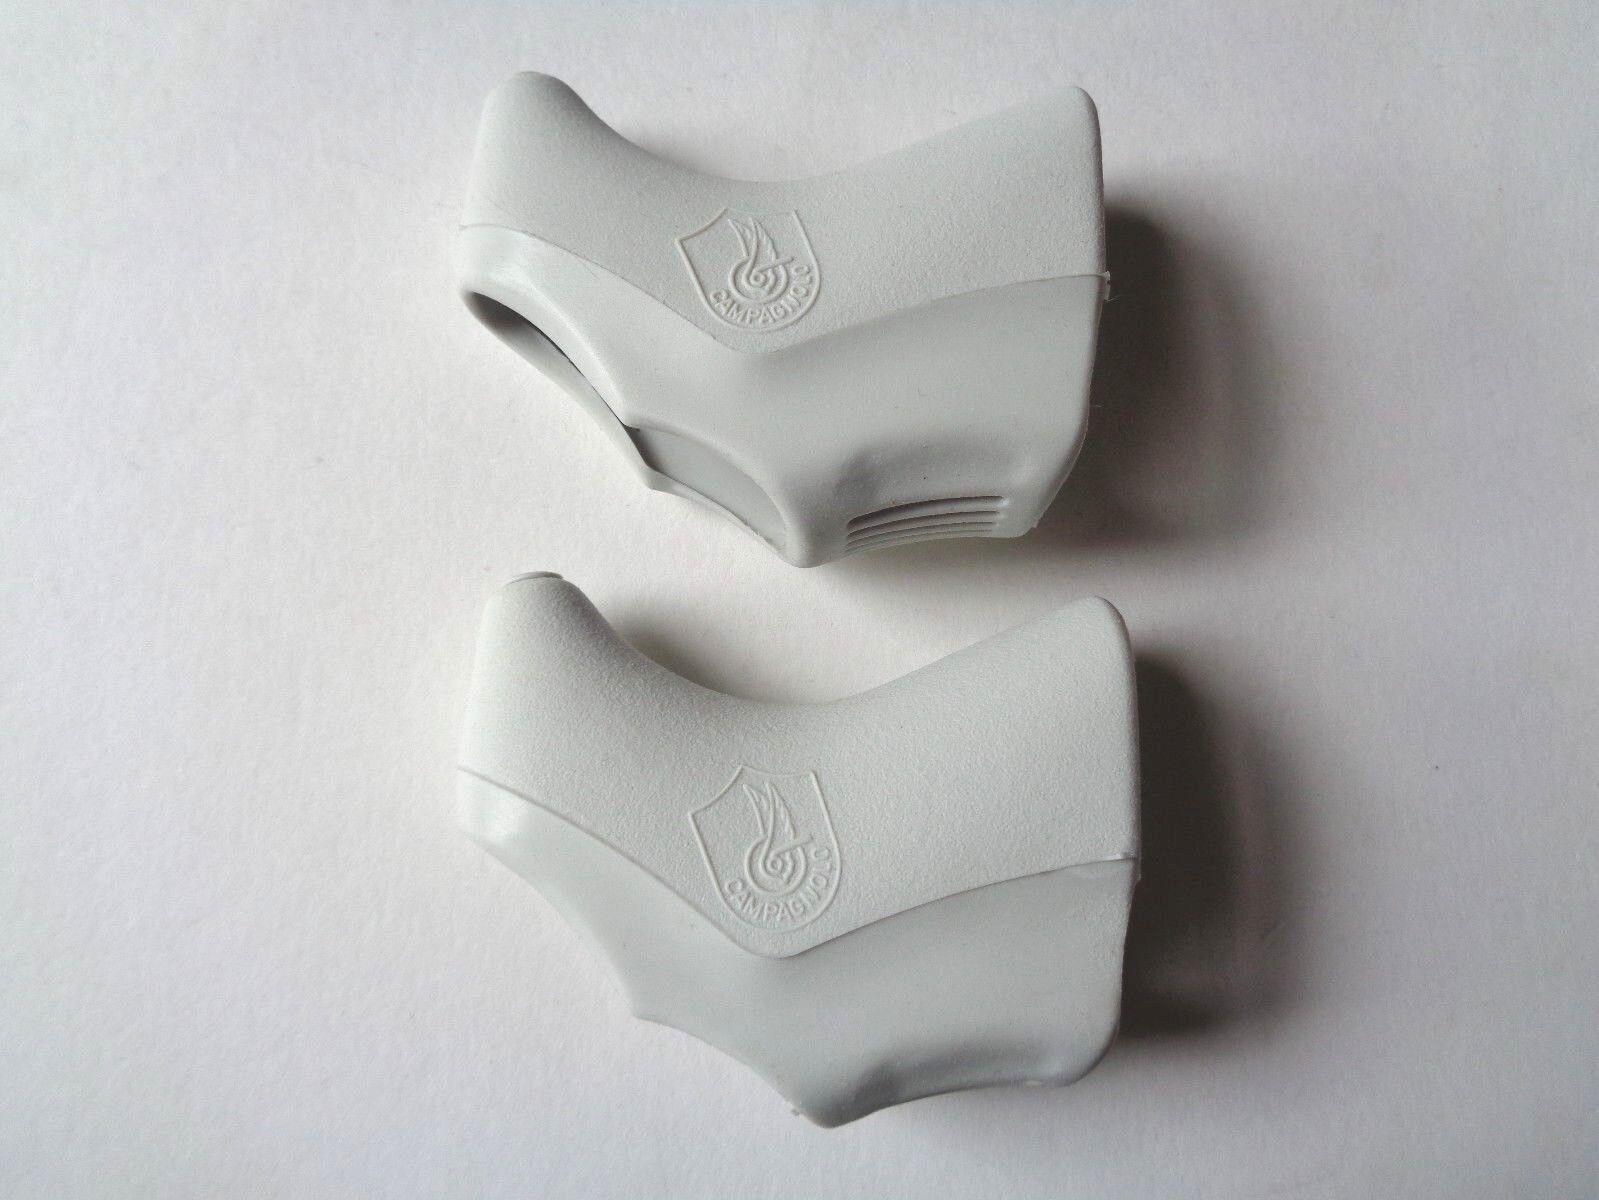 NOS Vintage 1980s 90s Campagnolo C Record Delta White Aero brake lever hoods